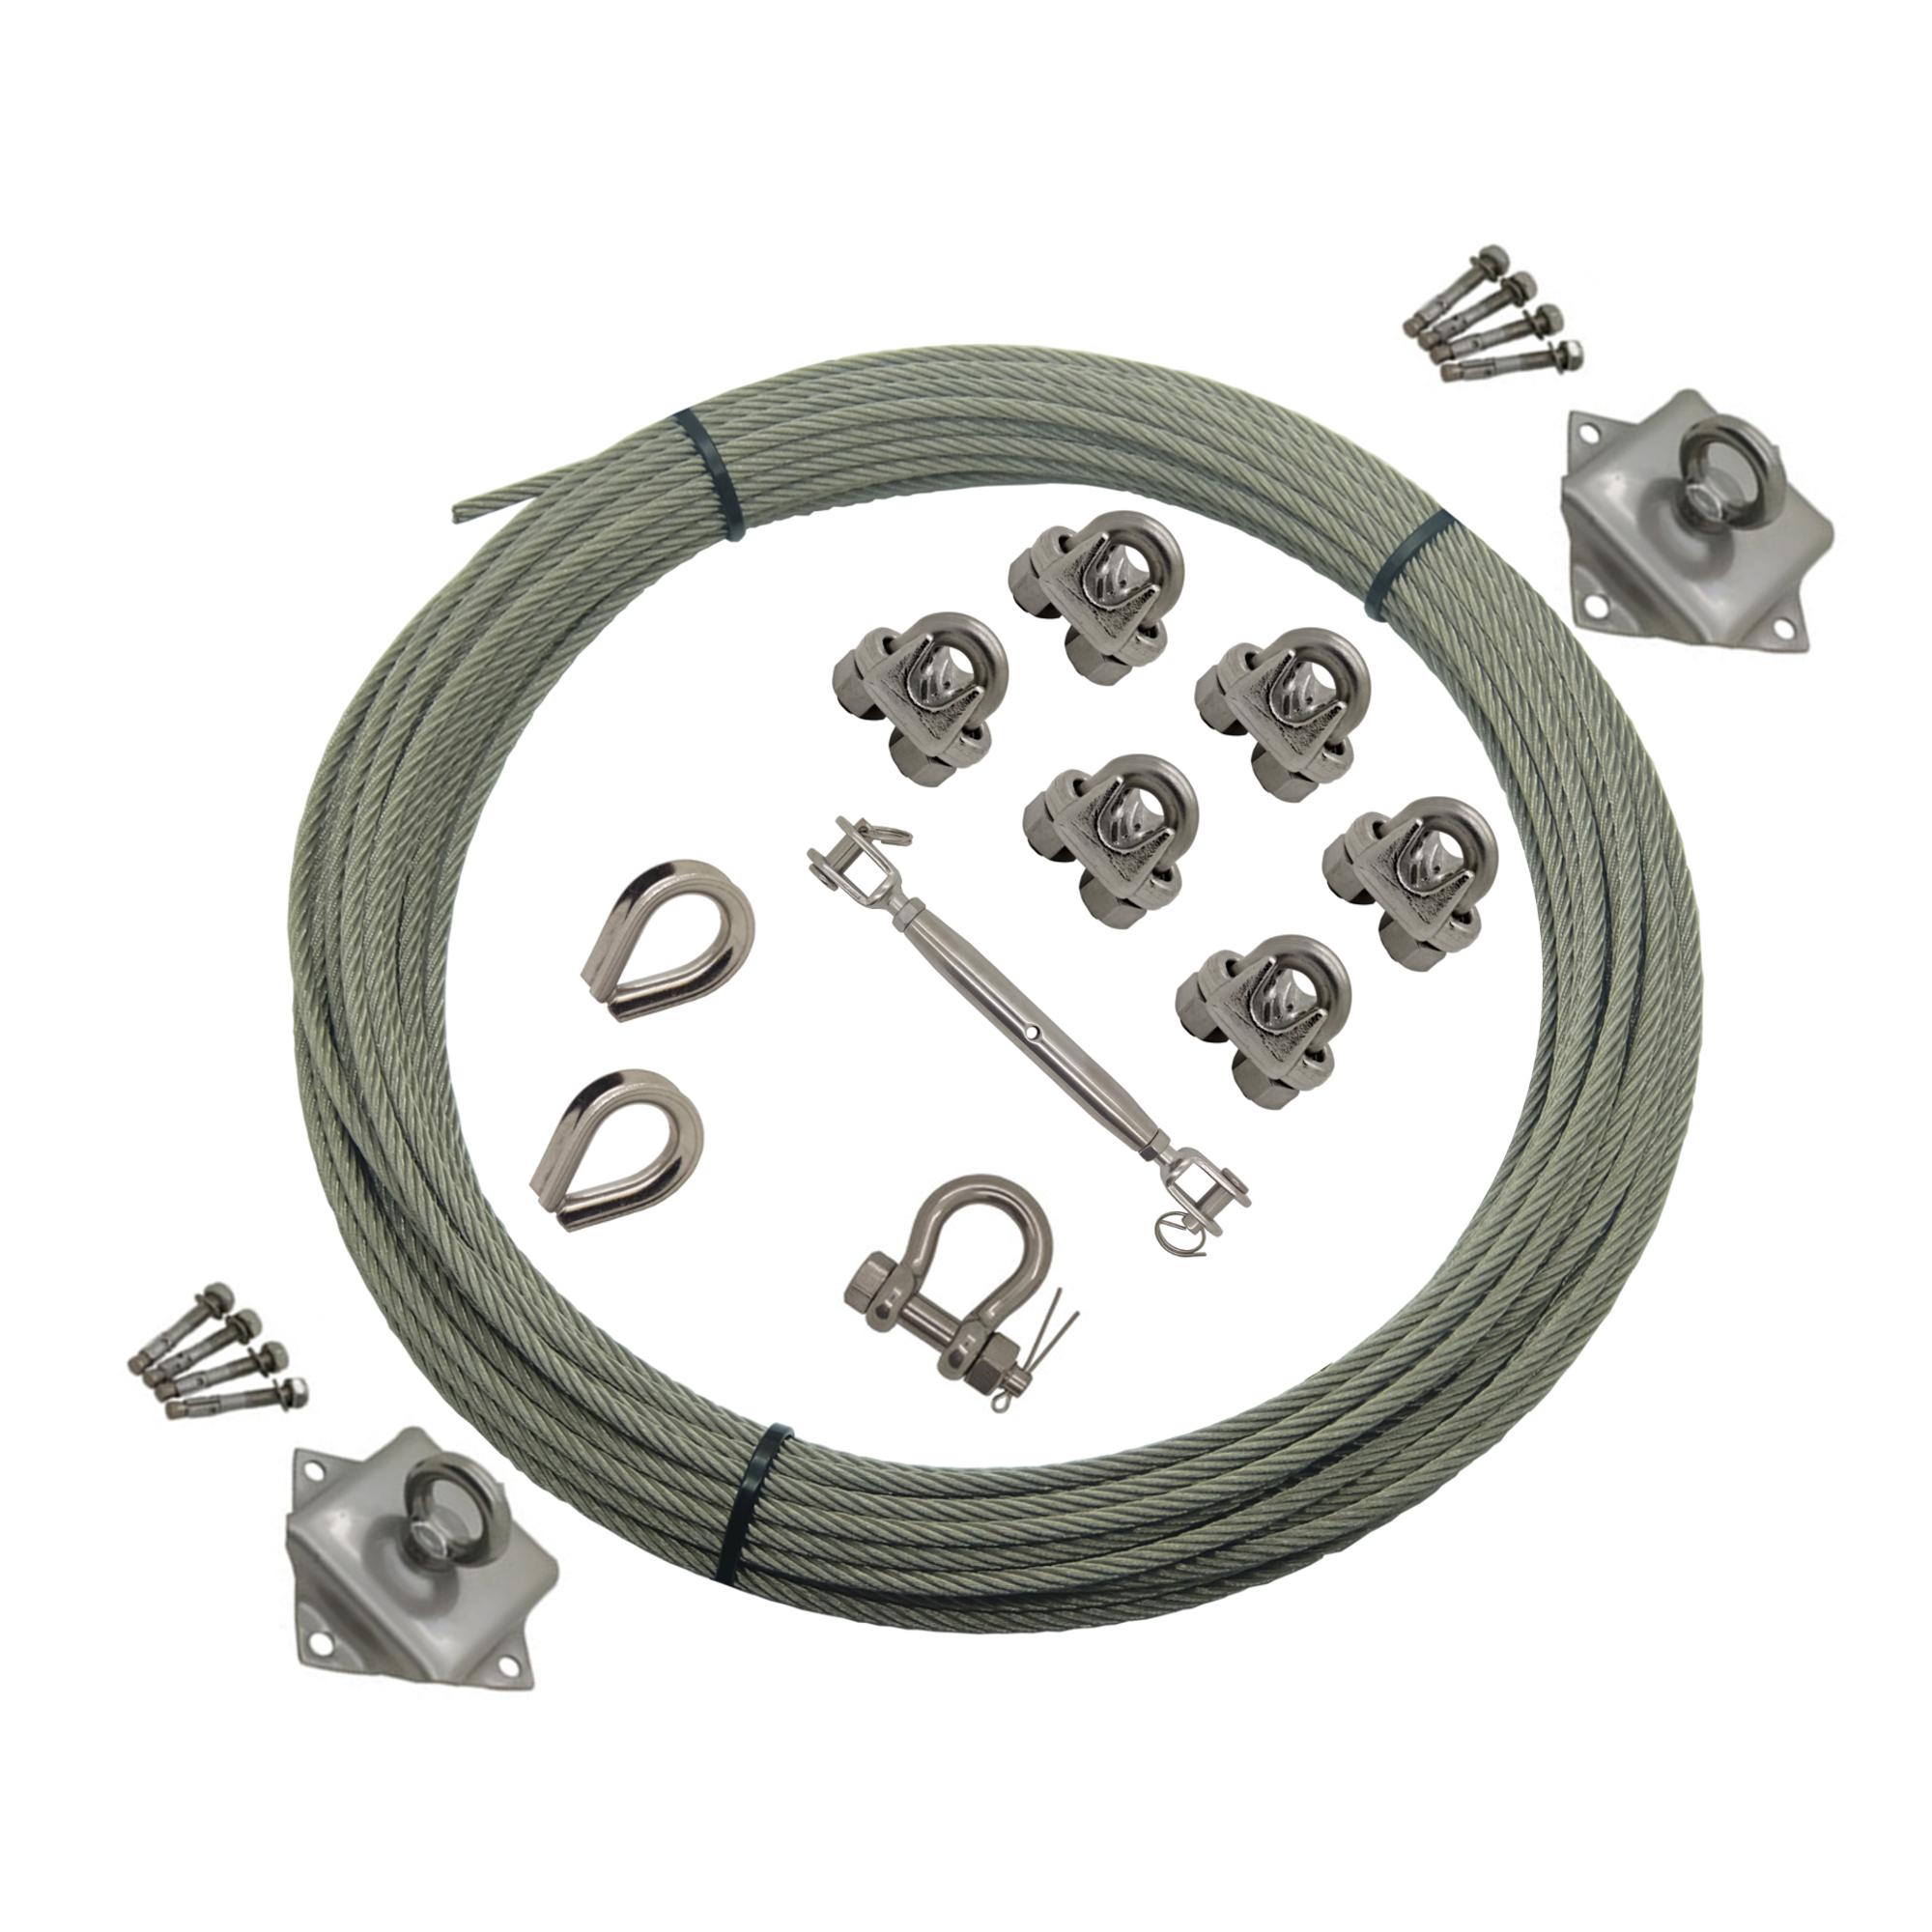 TECNI Ltd Stainless Steel Catenary Kit